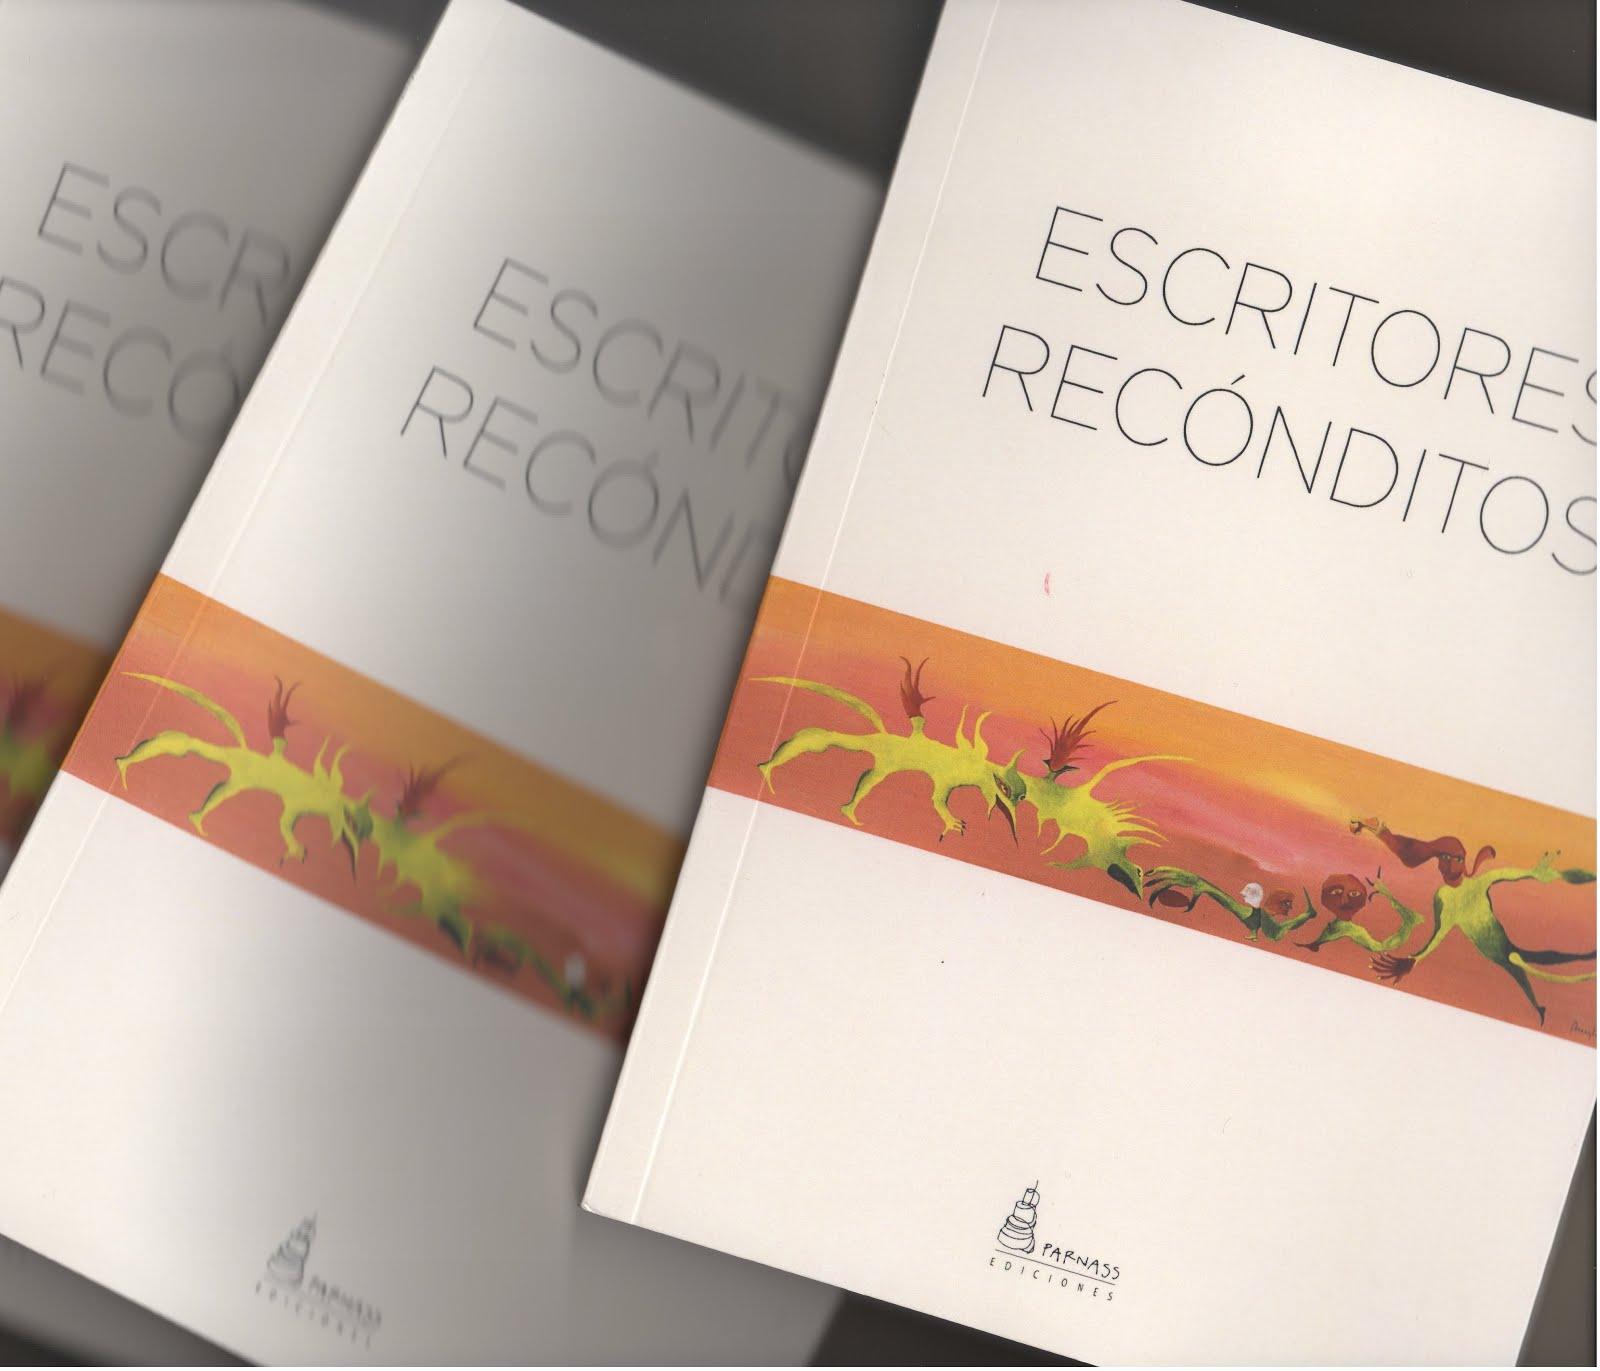 Edición. Recopilatorio de textos de Escritores Recónditos